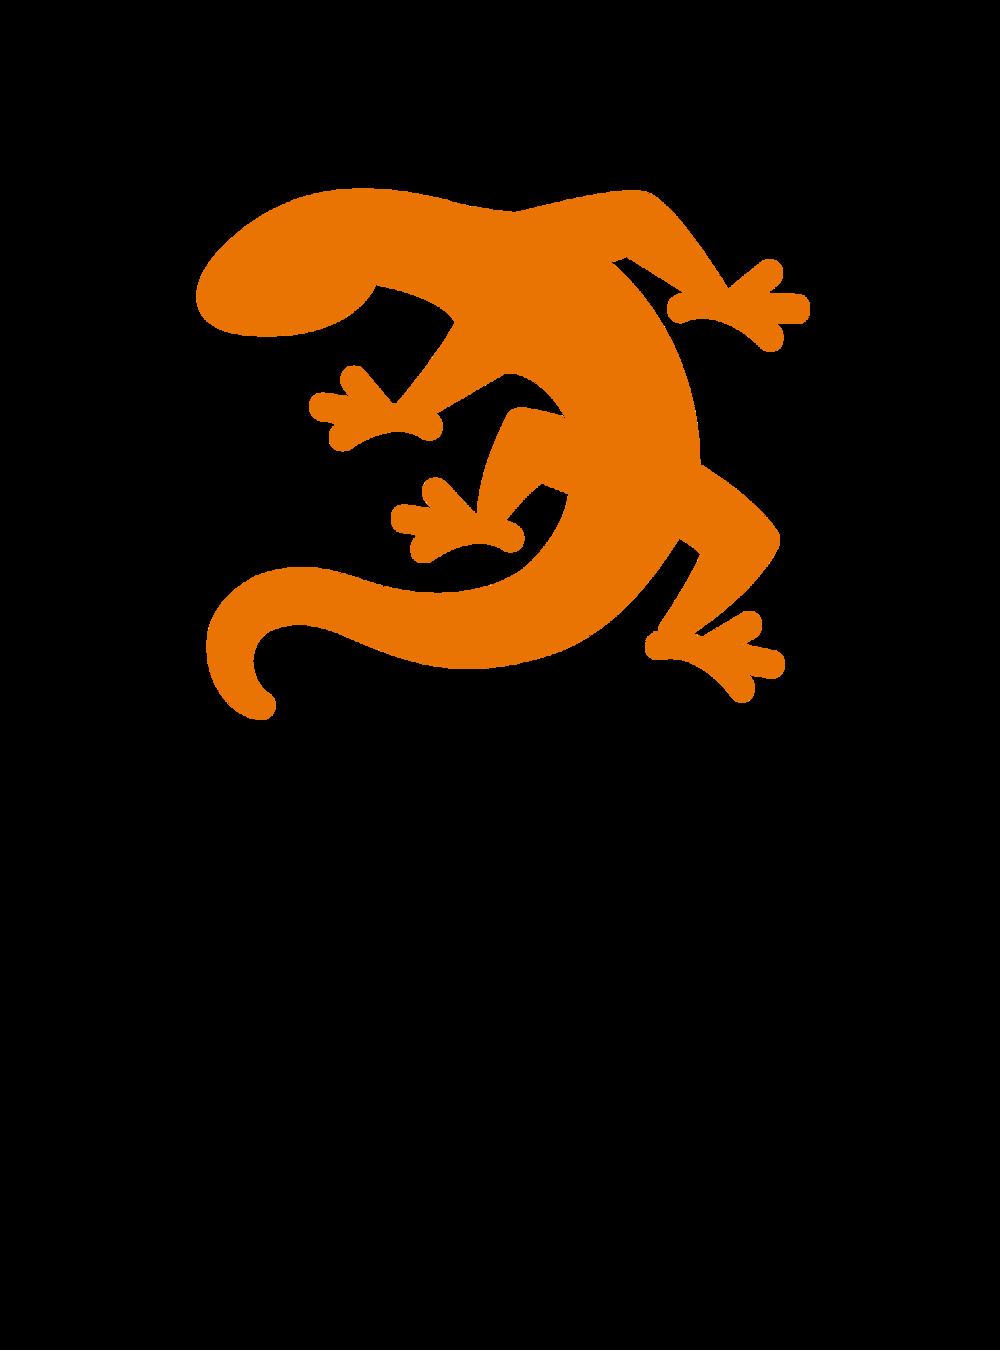 hld logo 1.png